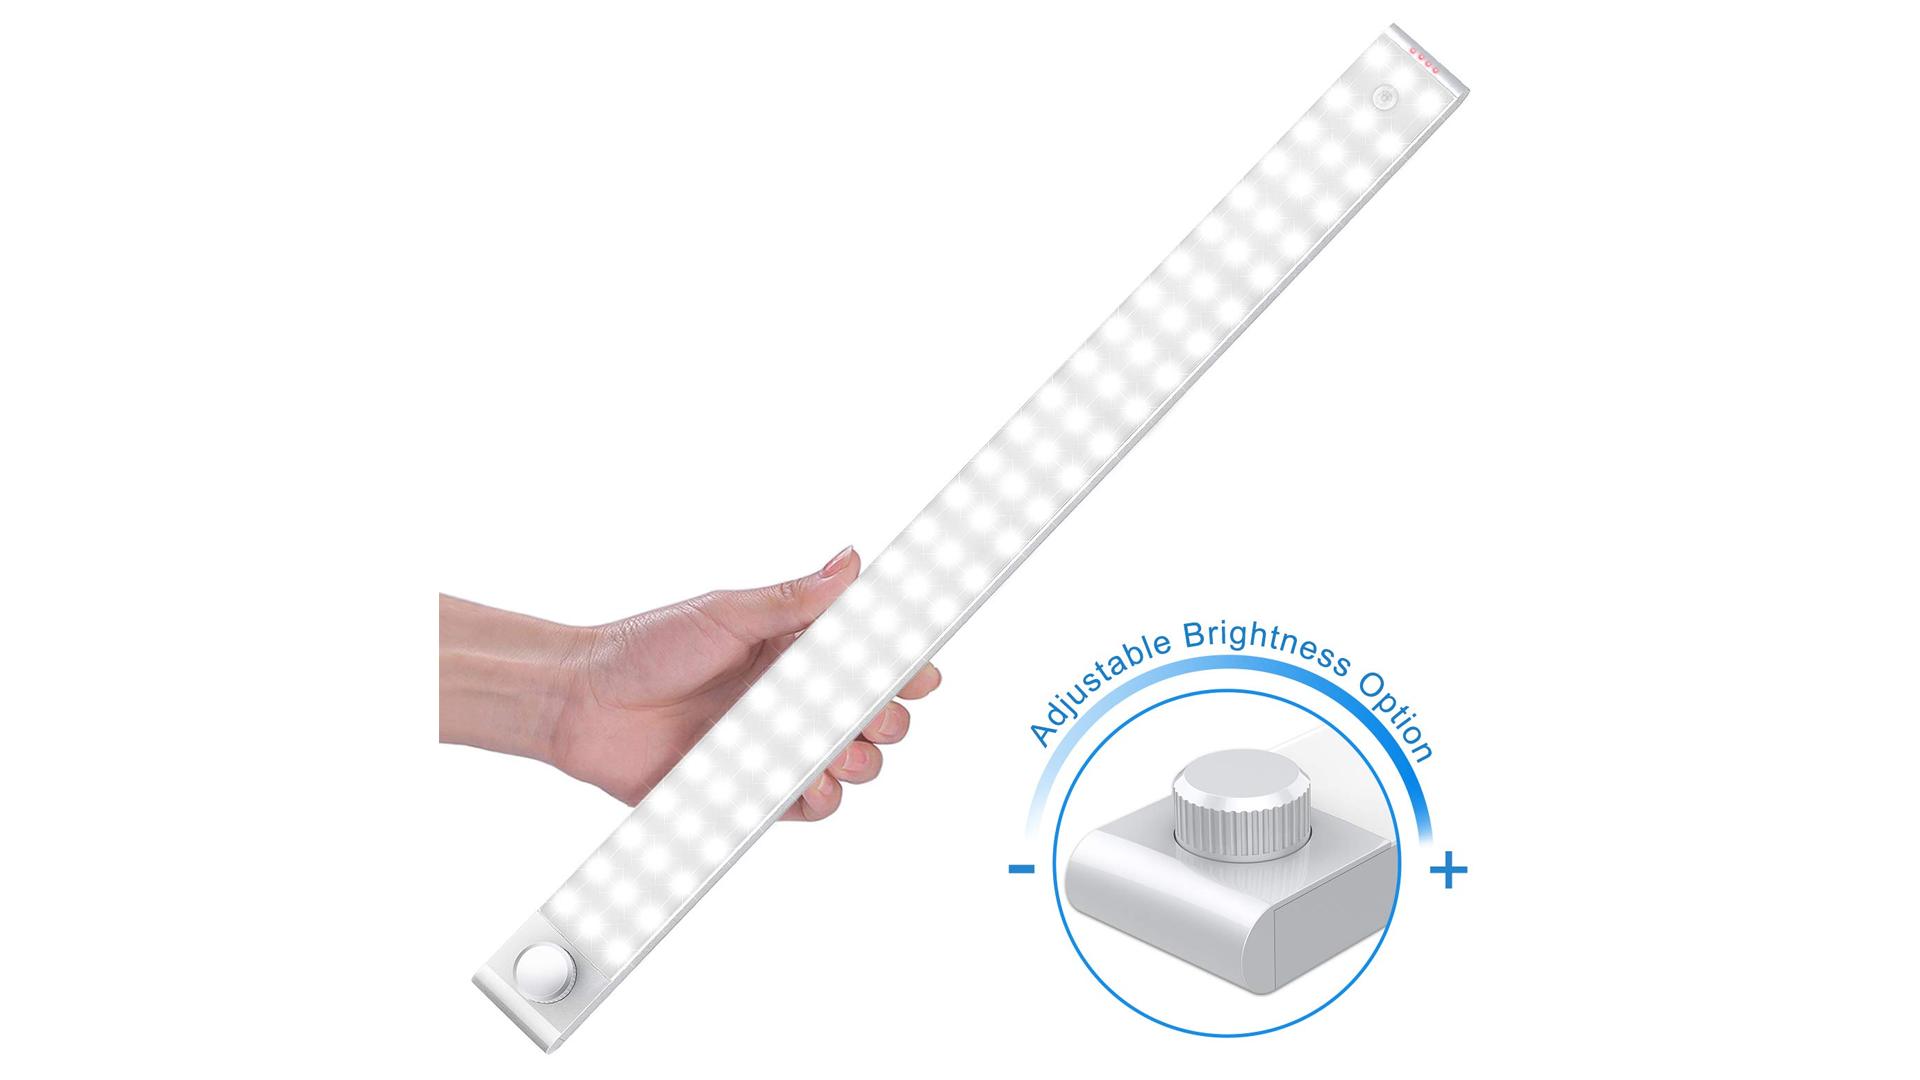 The LightBiz 78-LED Light Strip and Adjustable Brightness Knob.